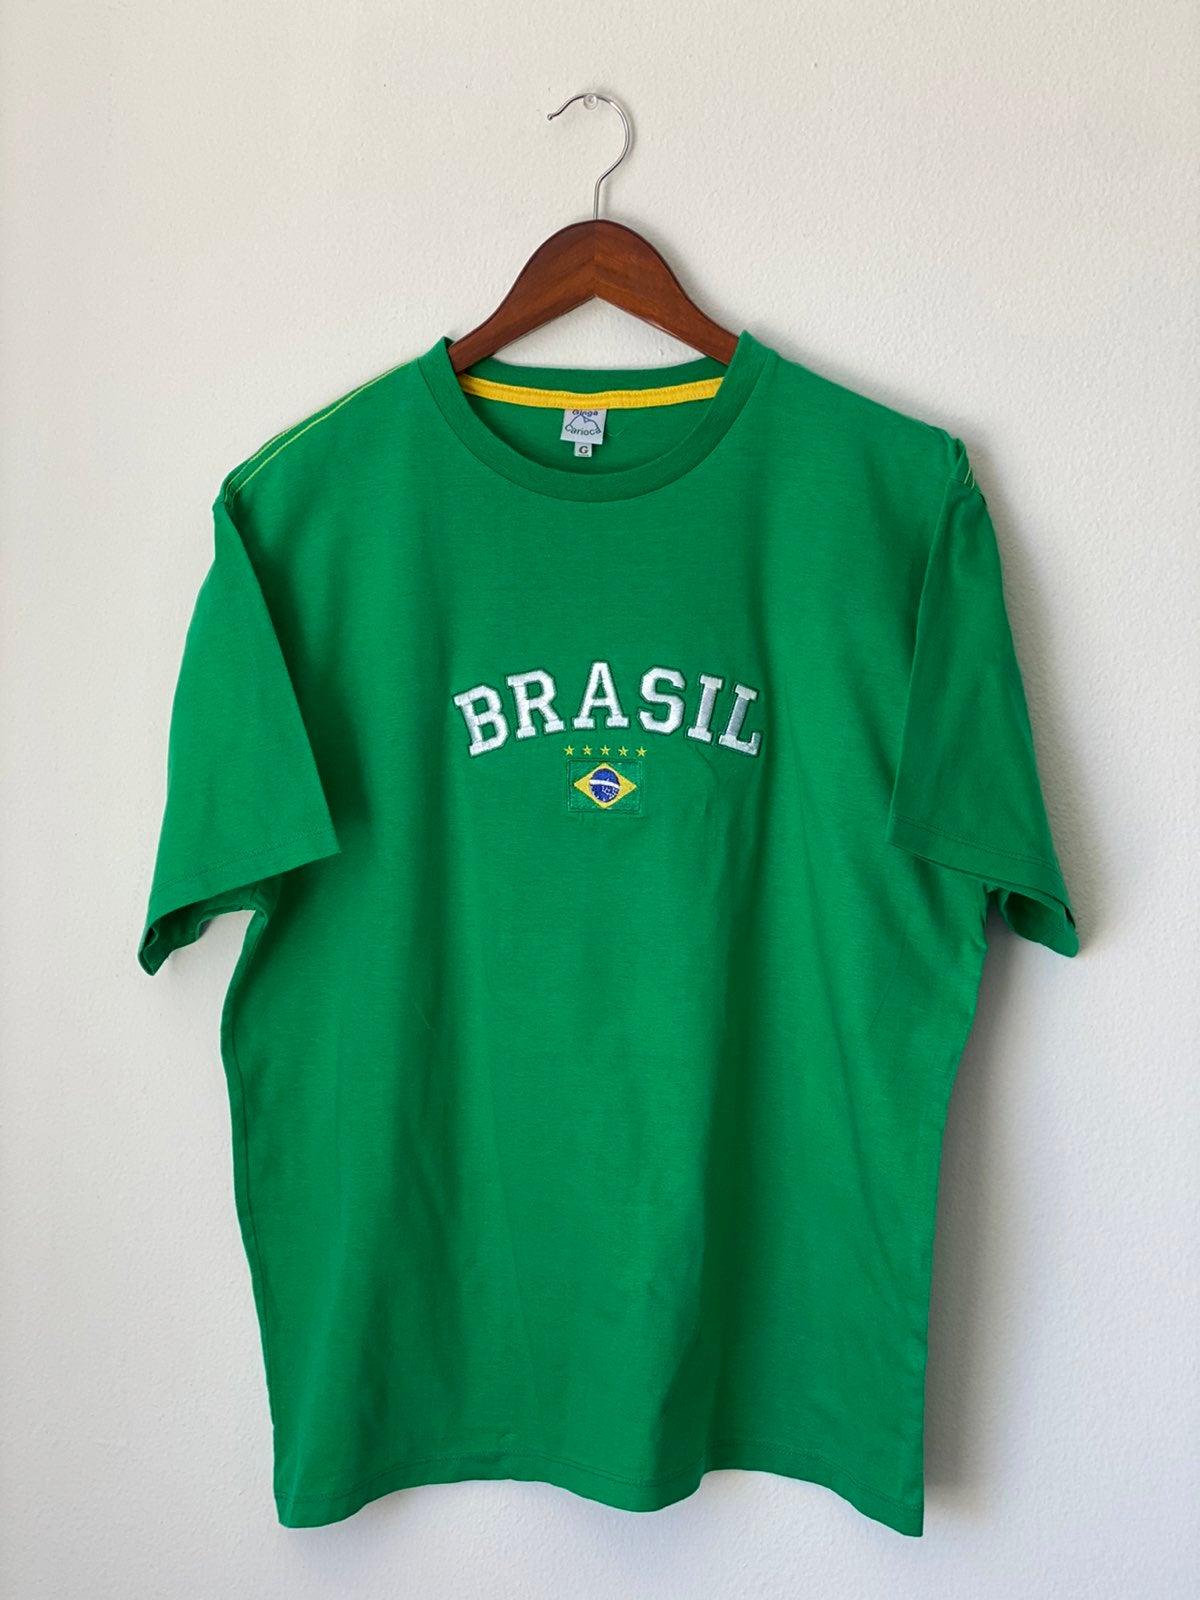 Vintage Brasil Shirt Sz L